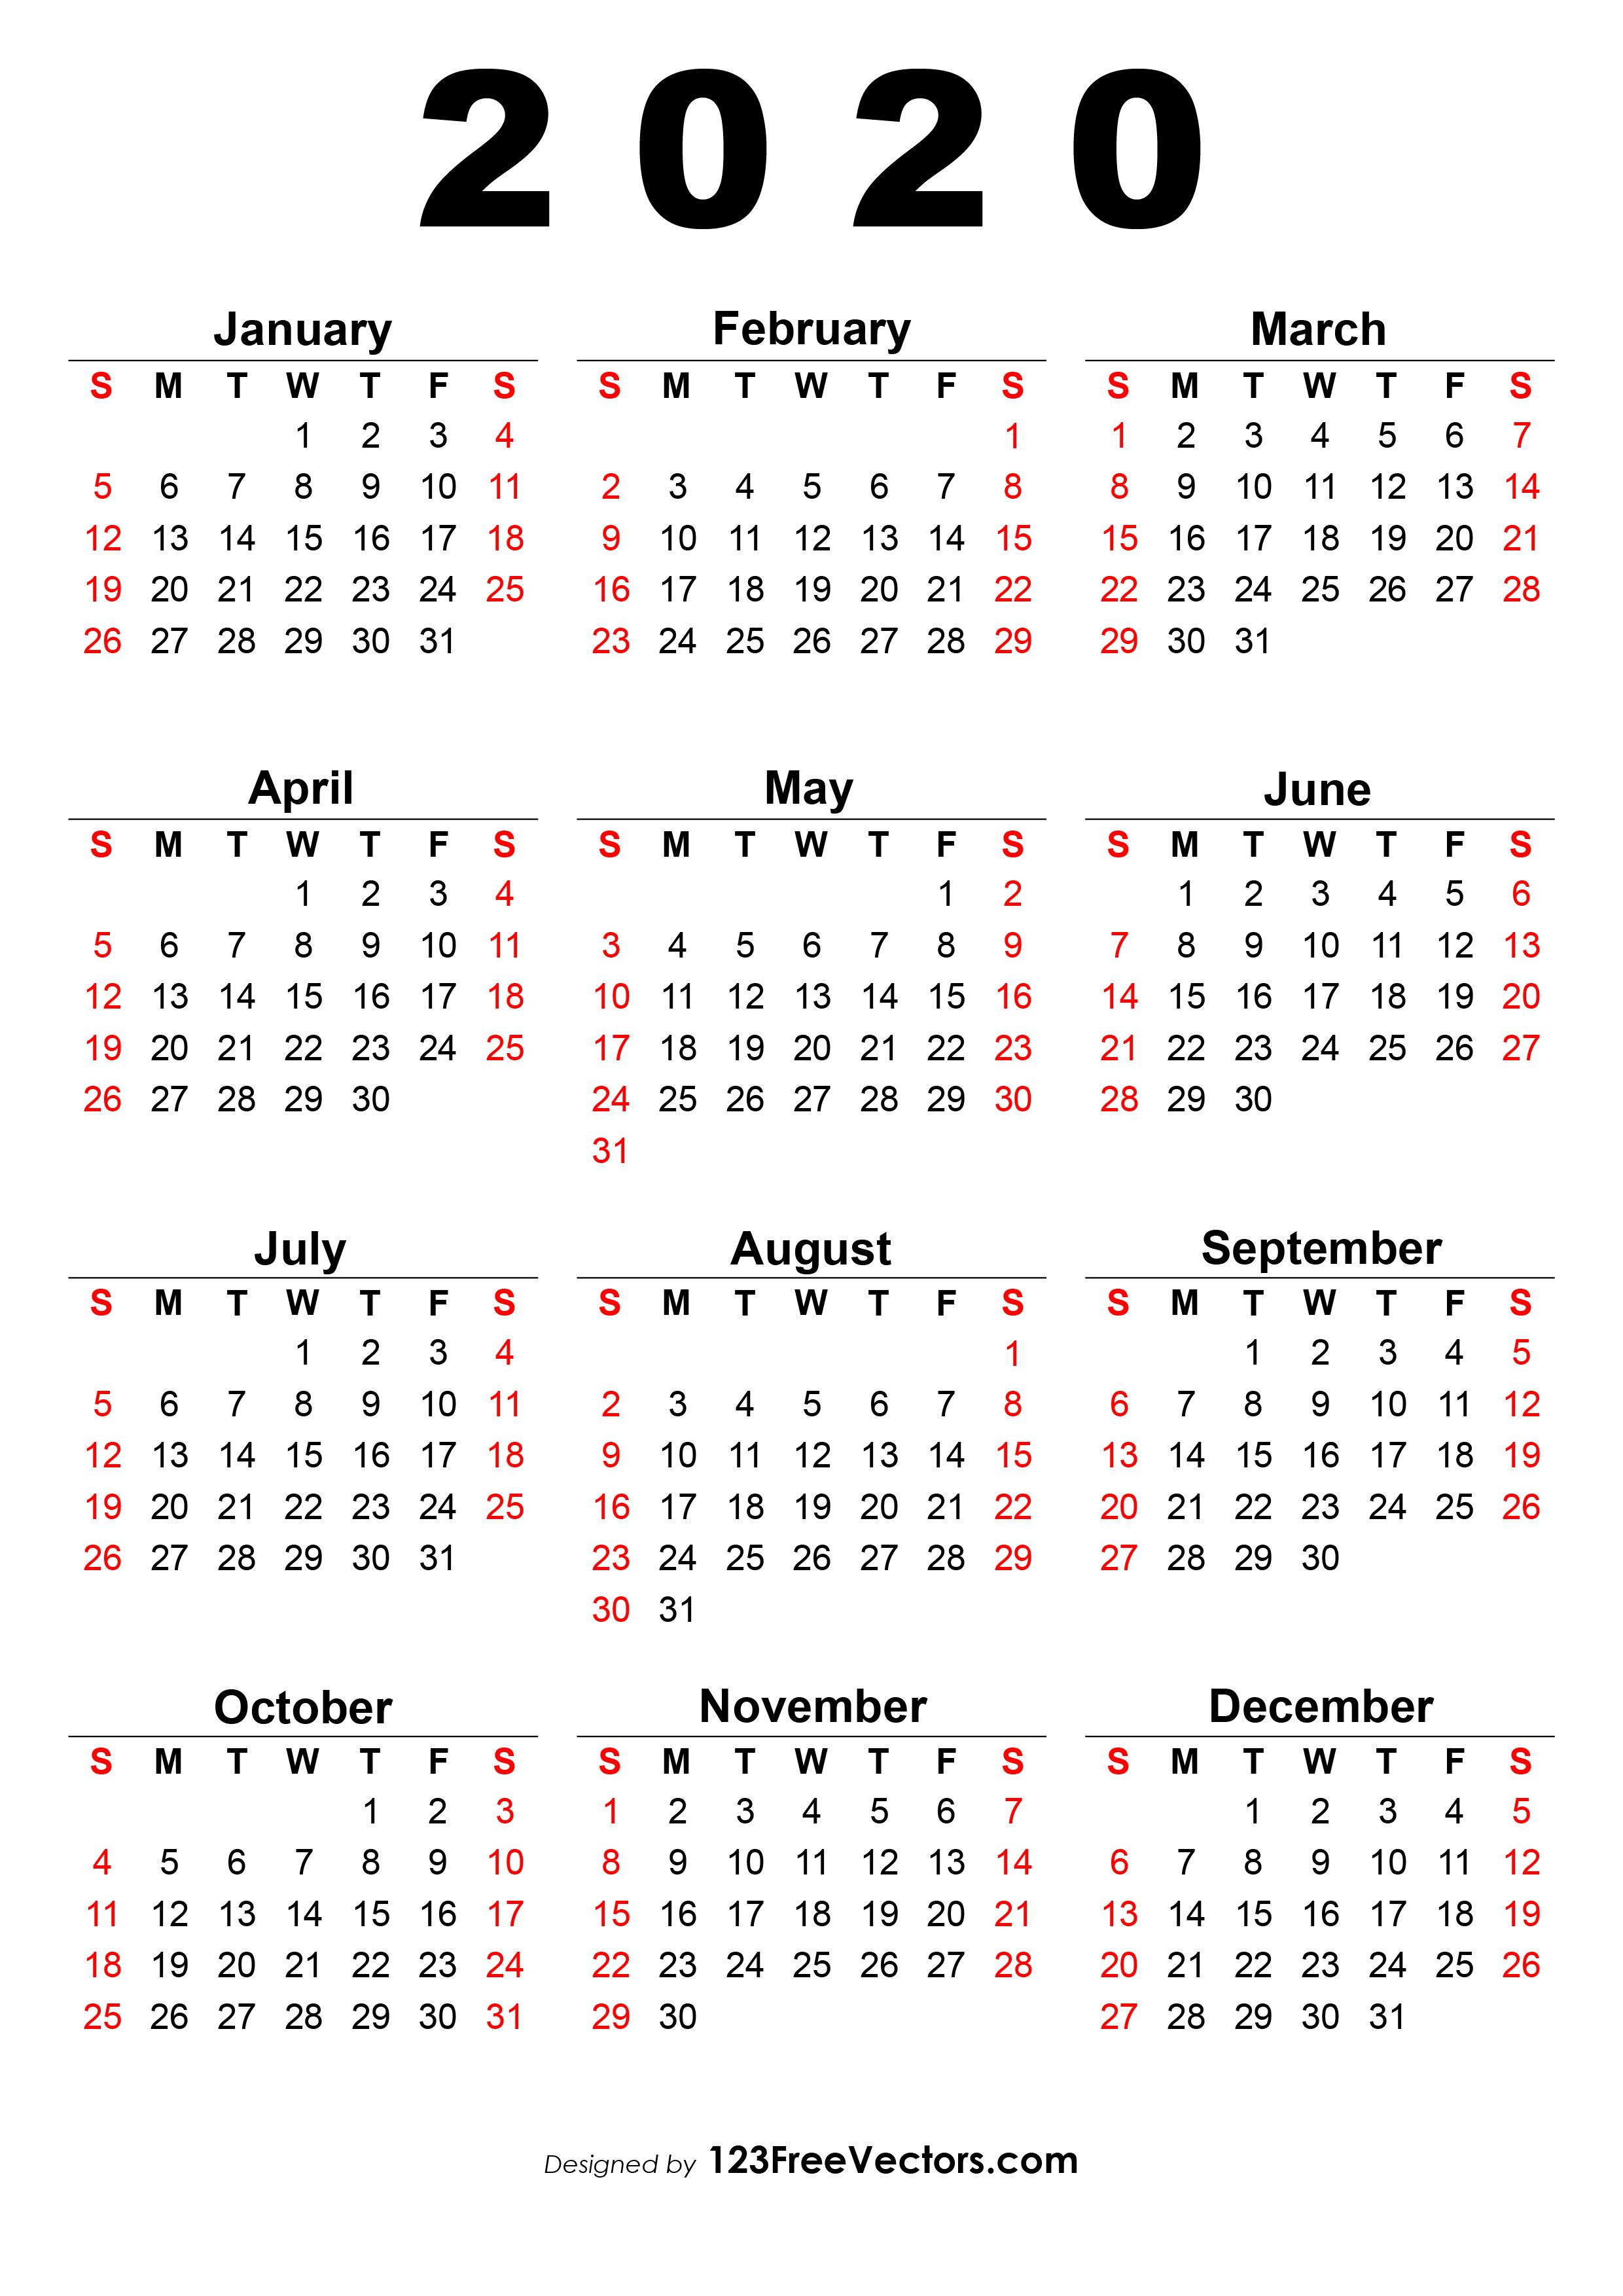 Printable 2020 Calendar One Page.2020 Calendar One Page